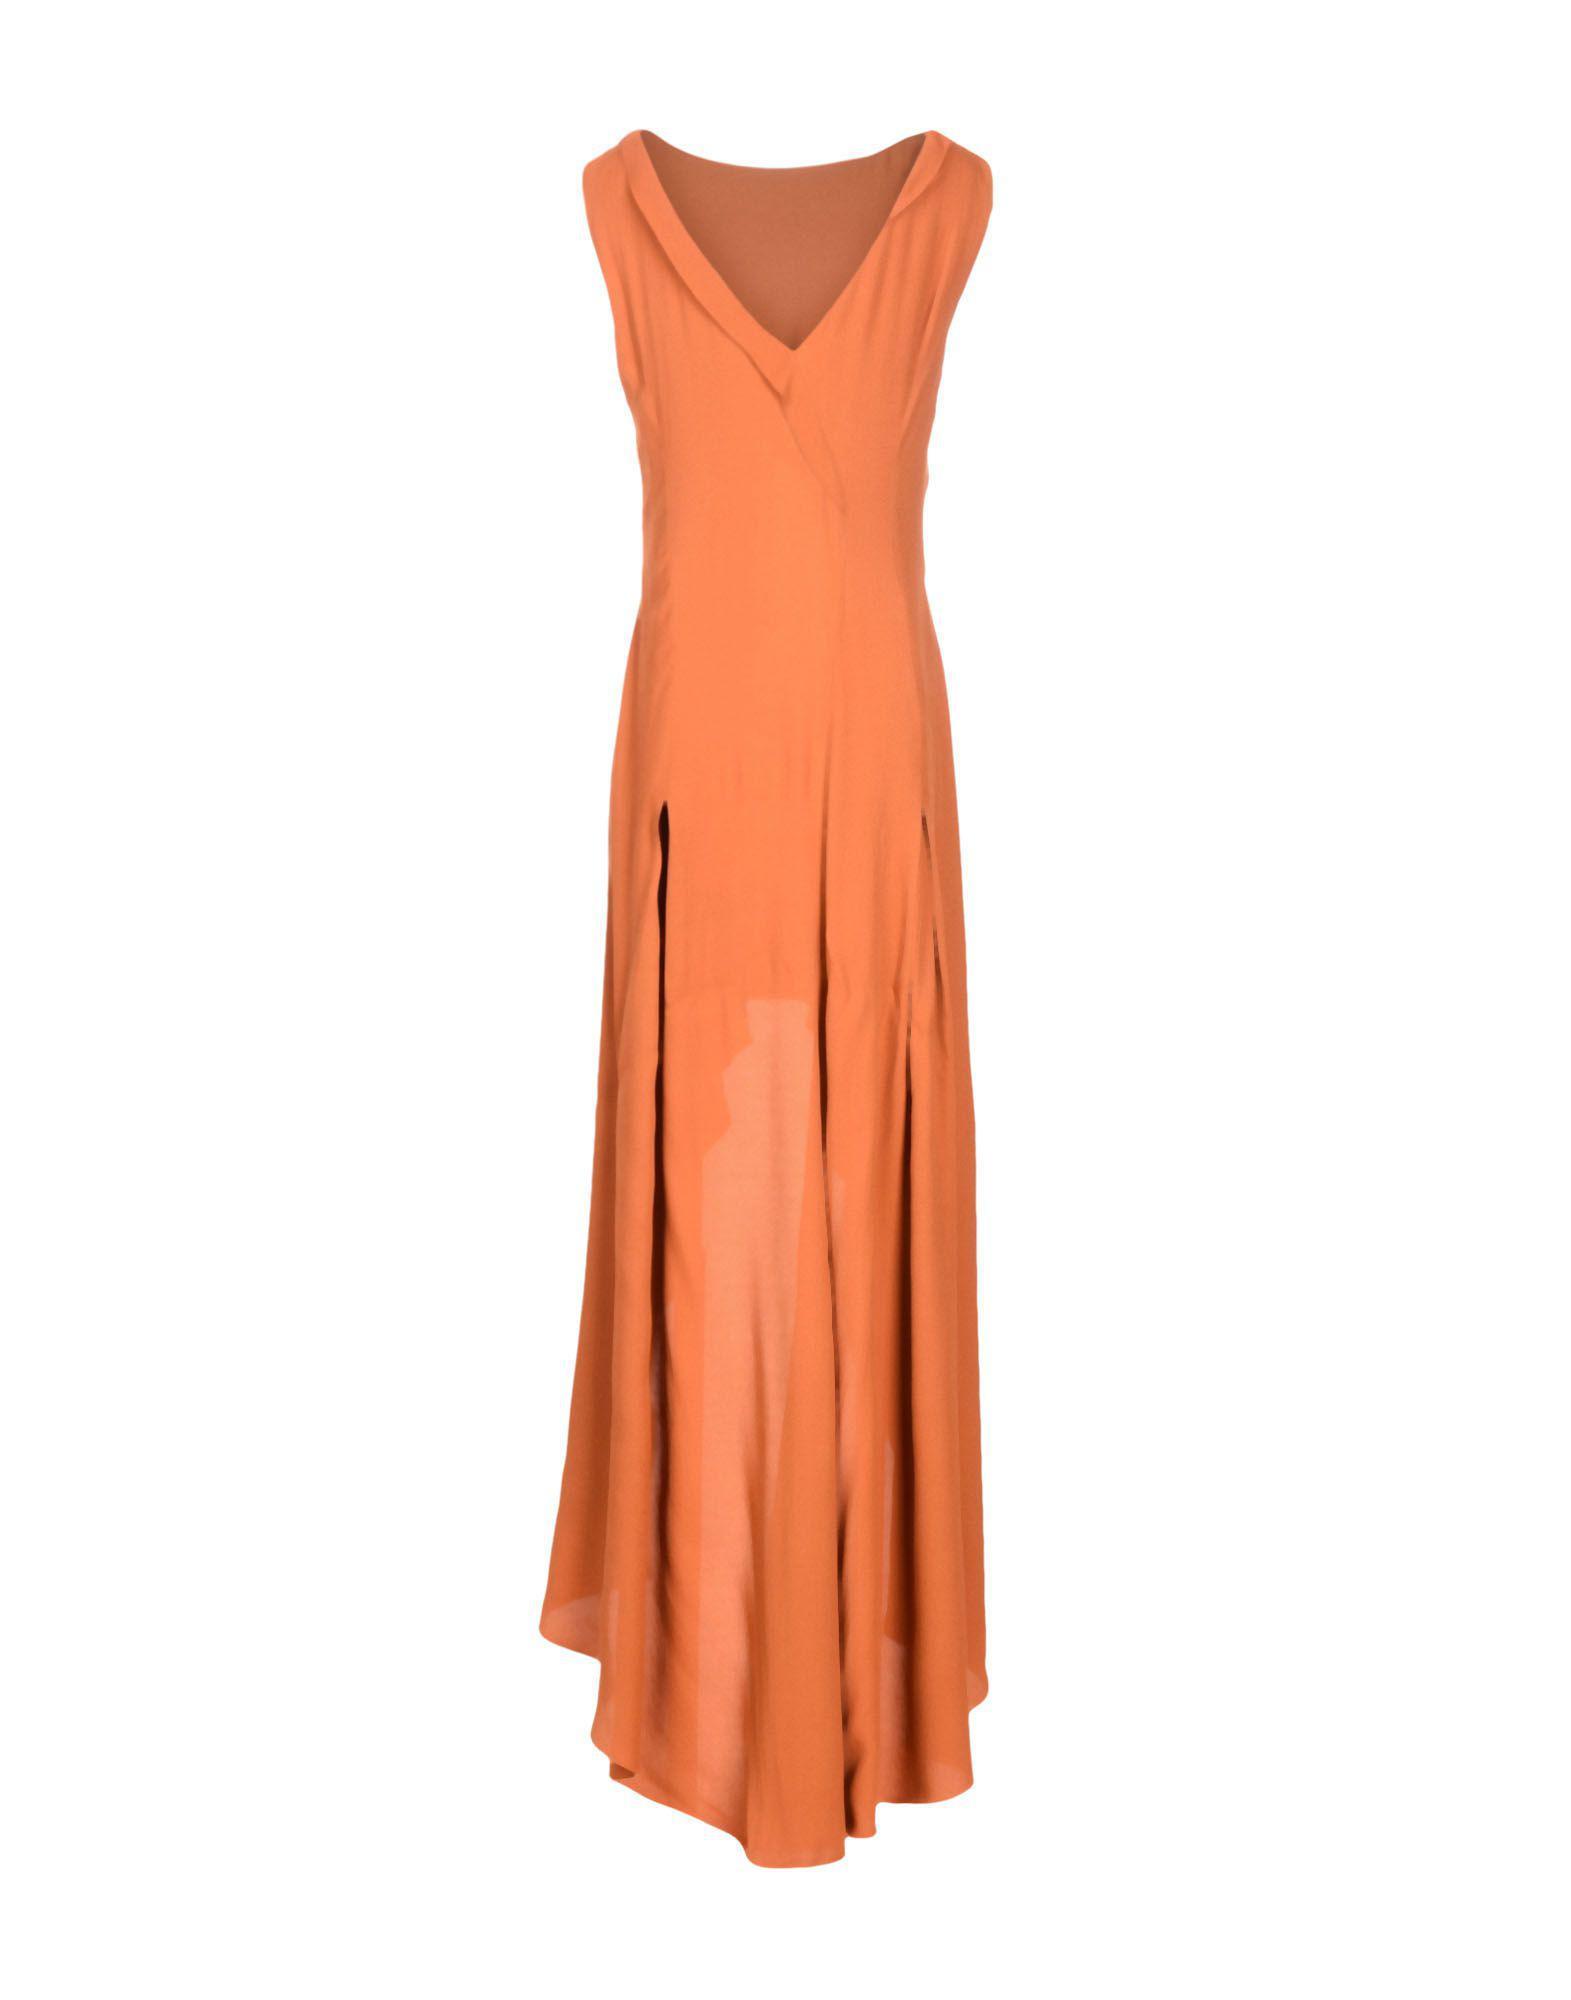 Philosophy di Alberta Ferretti Short Dress in Orange - Lyst 44bdcd507